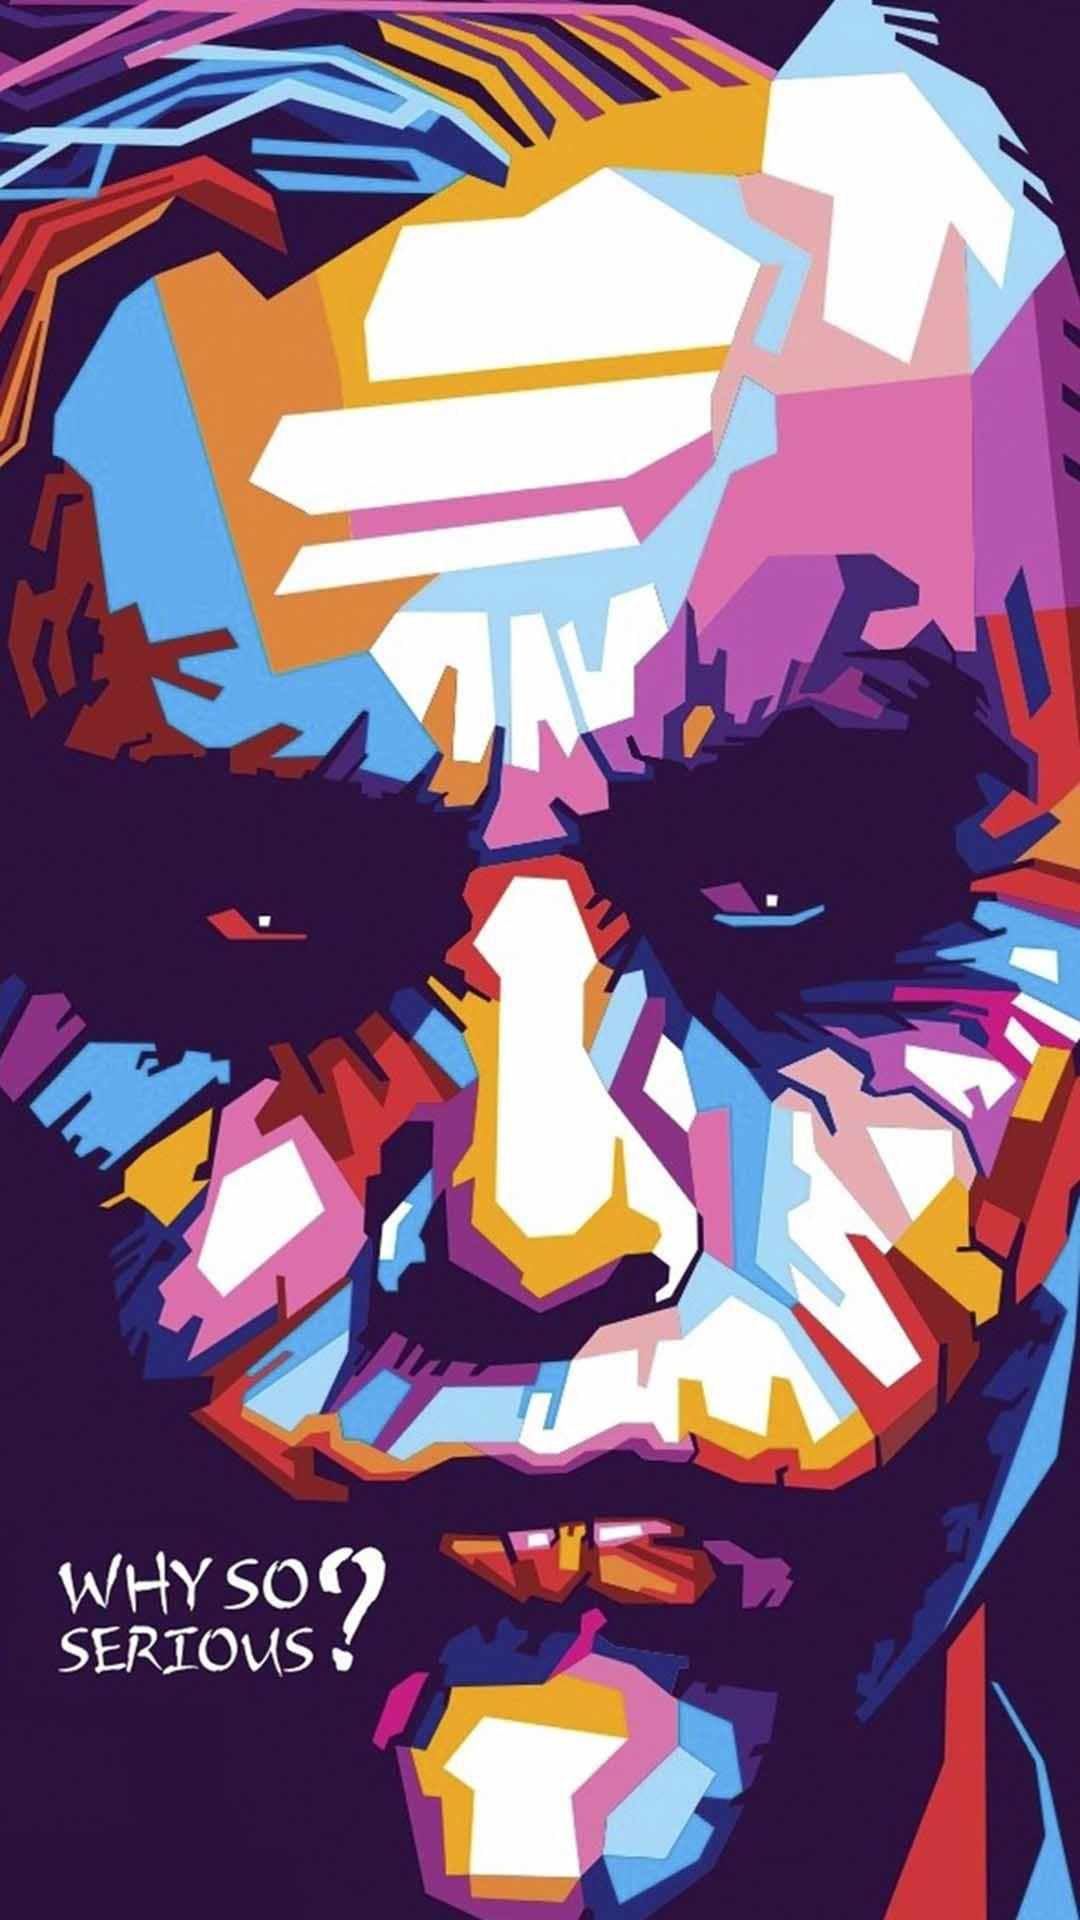 Why so serious? Joker iphone wallpaper, Joker artwork